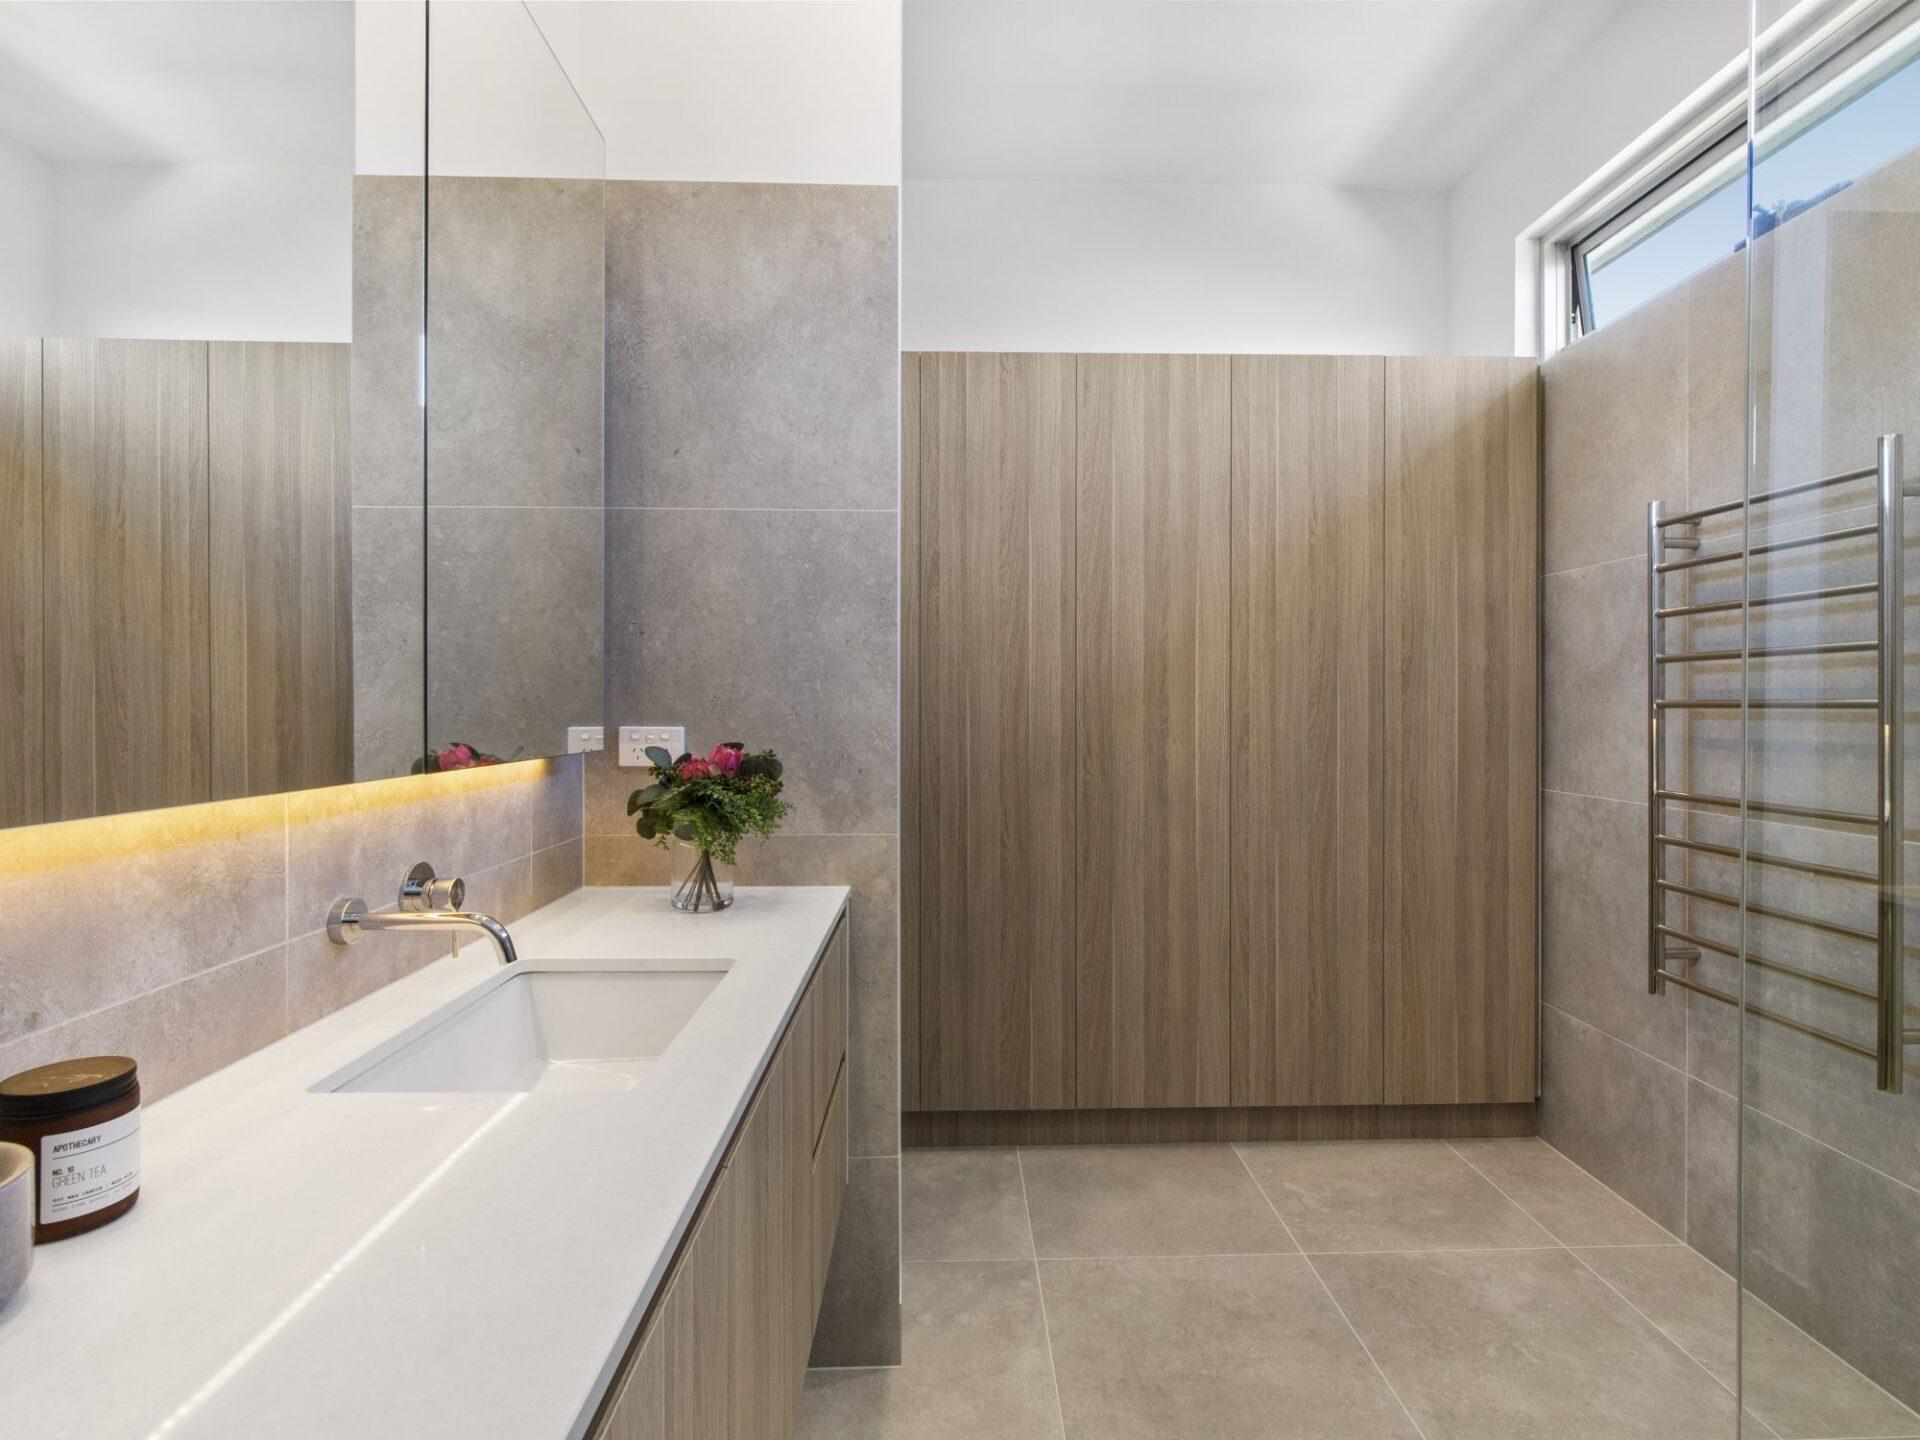 Bathroom Renovations Services - Bayview Renovations